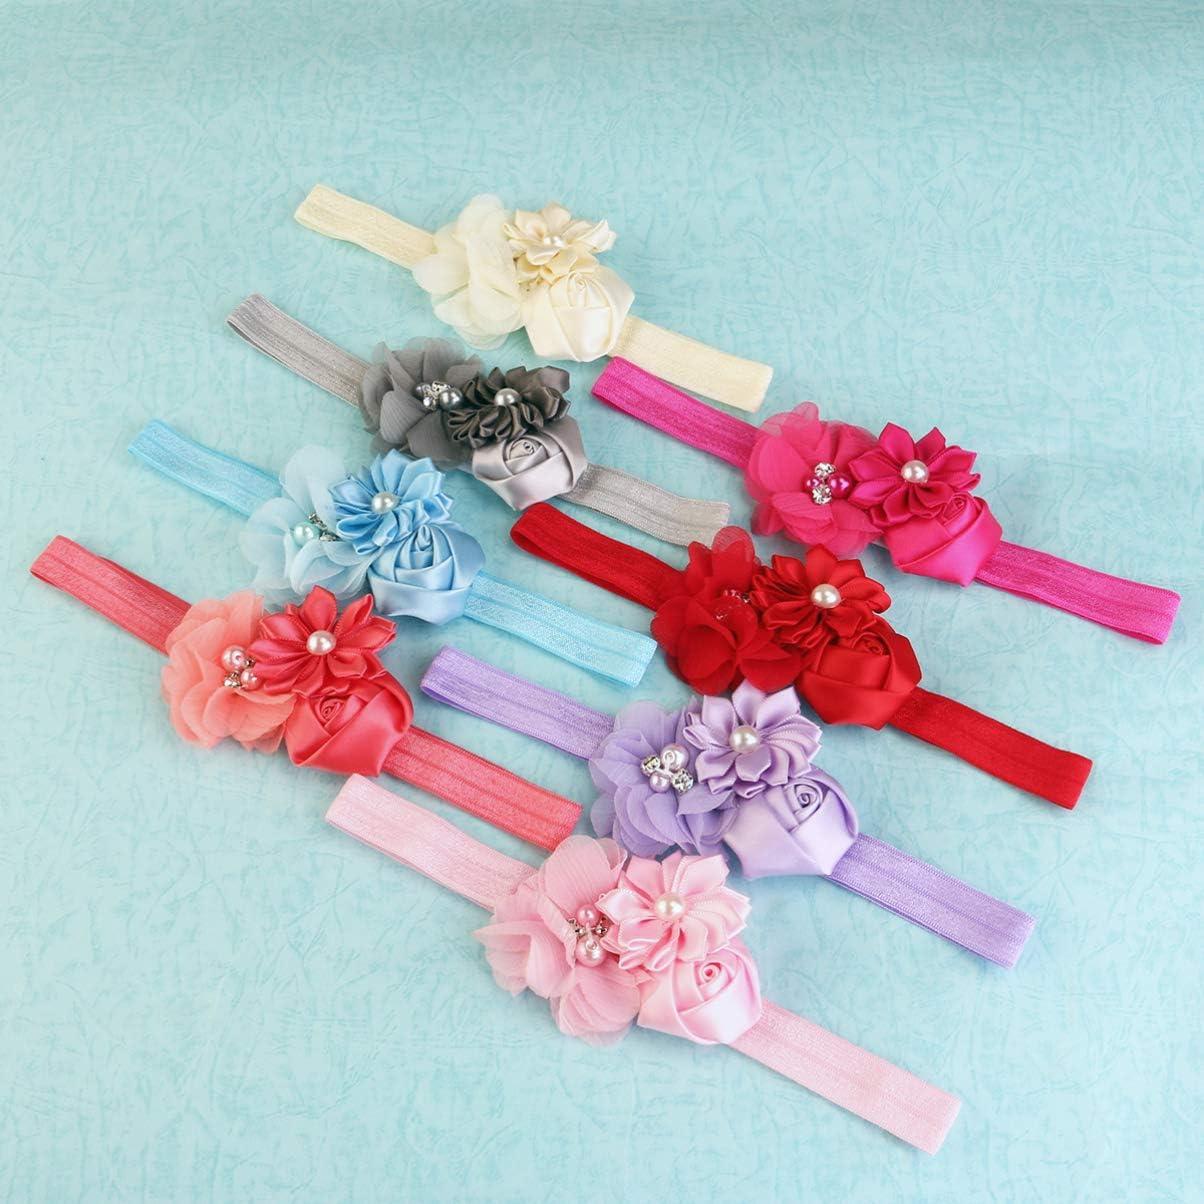 NUOLUX 8ST Cute Baby Girls Sweet Rose Blumen Perle elastisch Haarband Haar Band Zubeh/ör Foto Props